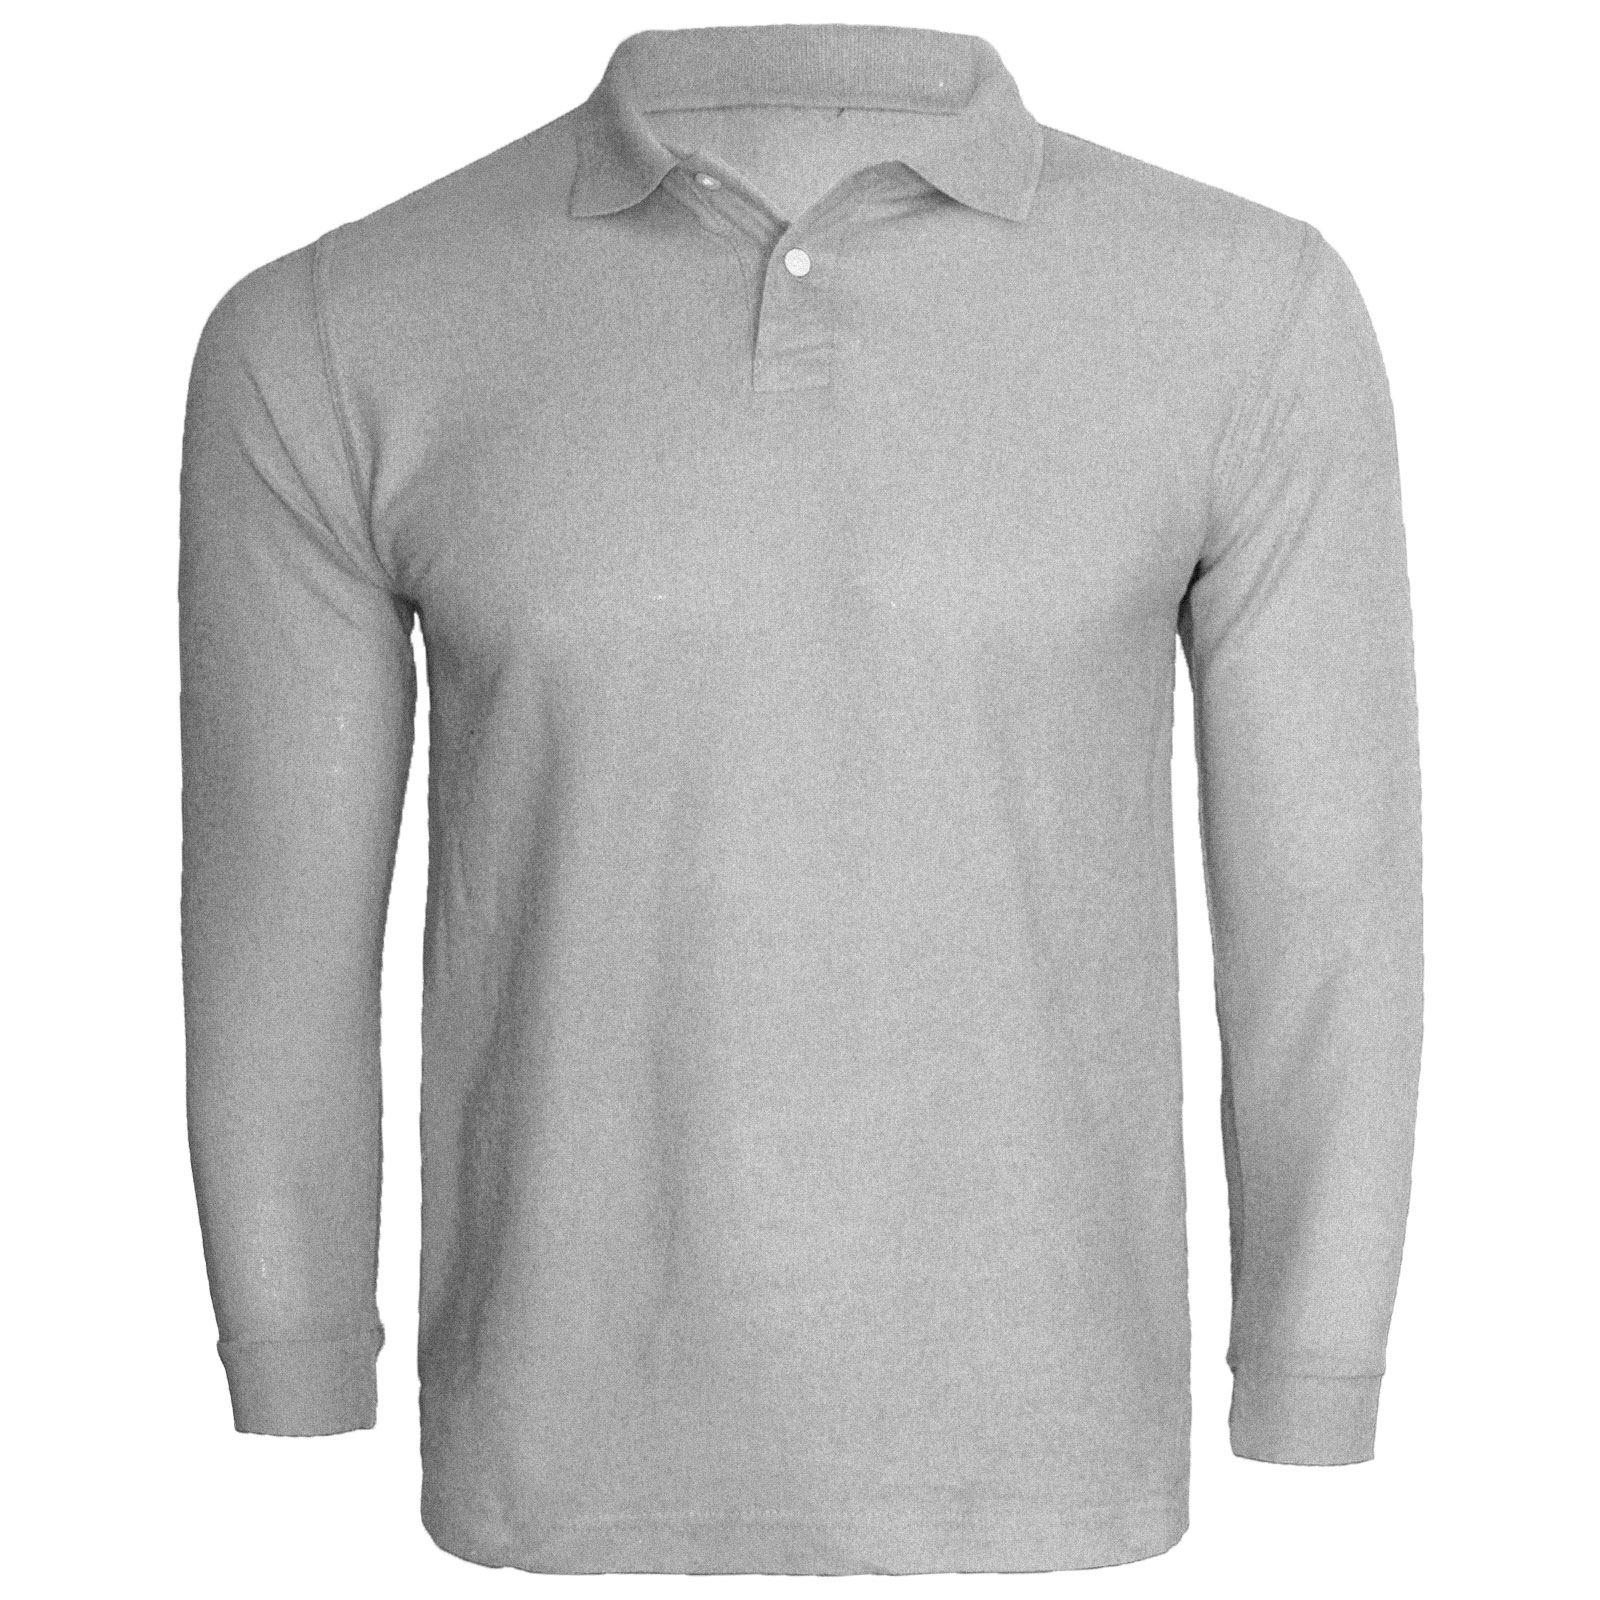 Kids boys girls long sleeve polo shirt button t shirt top for Long sleeved polo shirts for boys